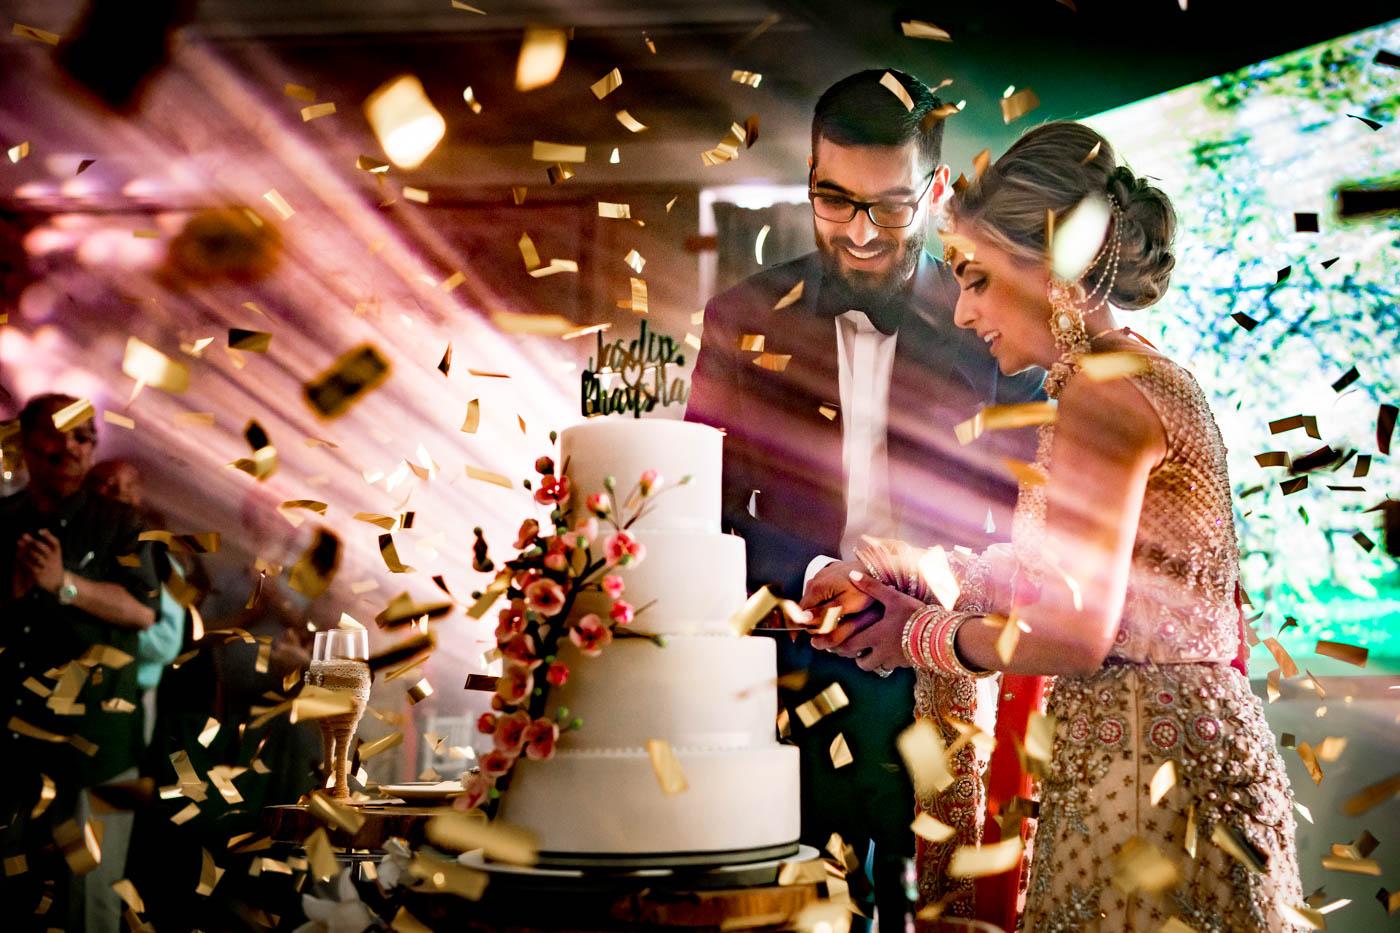 Wedding Photography Jobs Abroad: Belfry Hotel & Resort Asian Wedding Photography